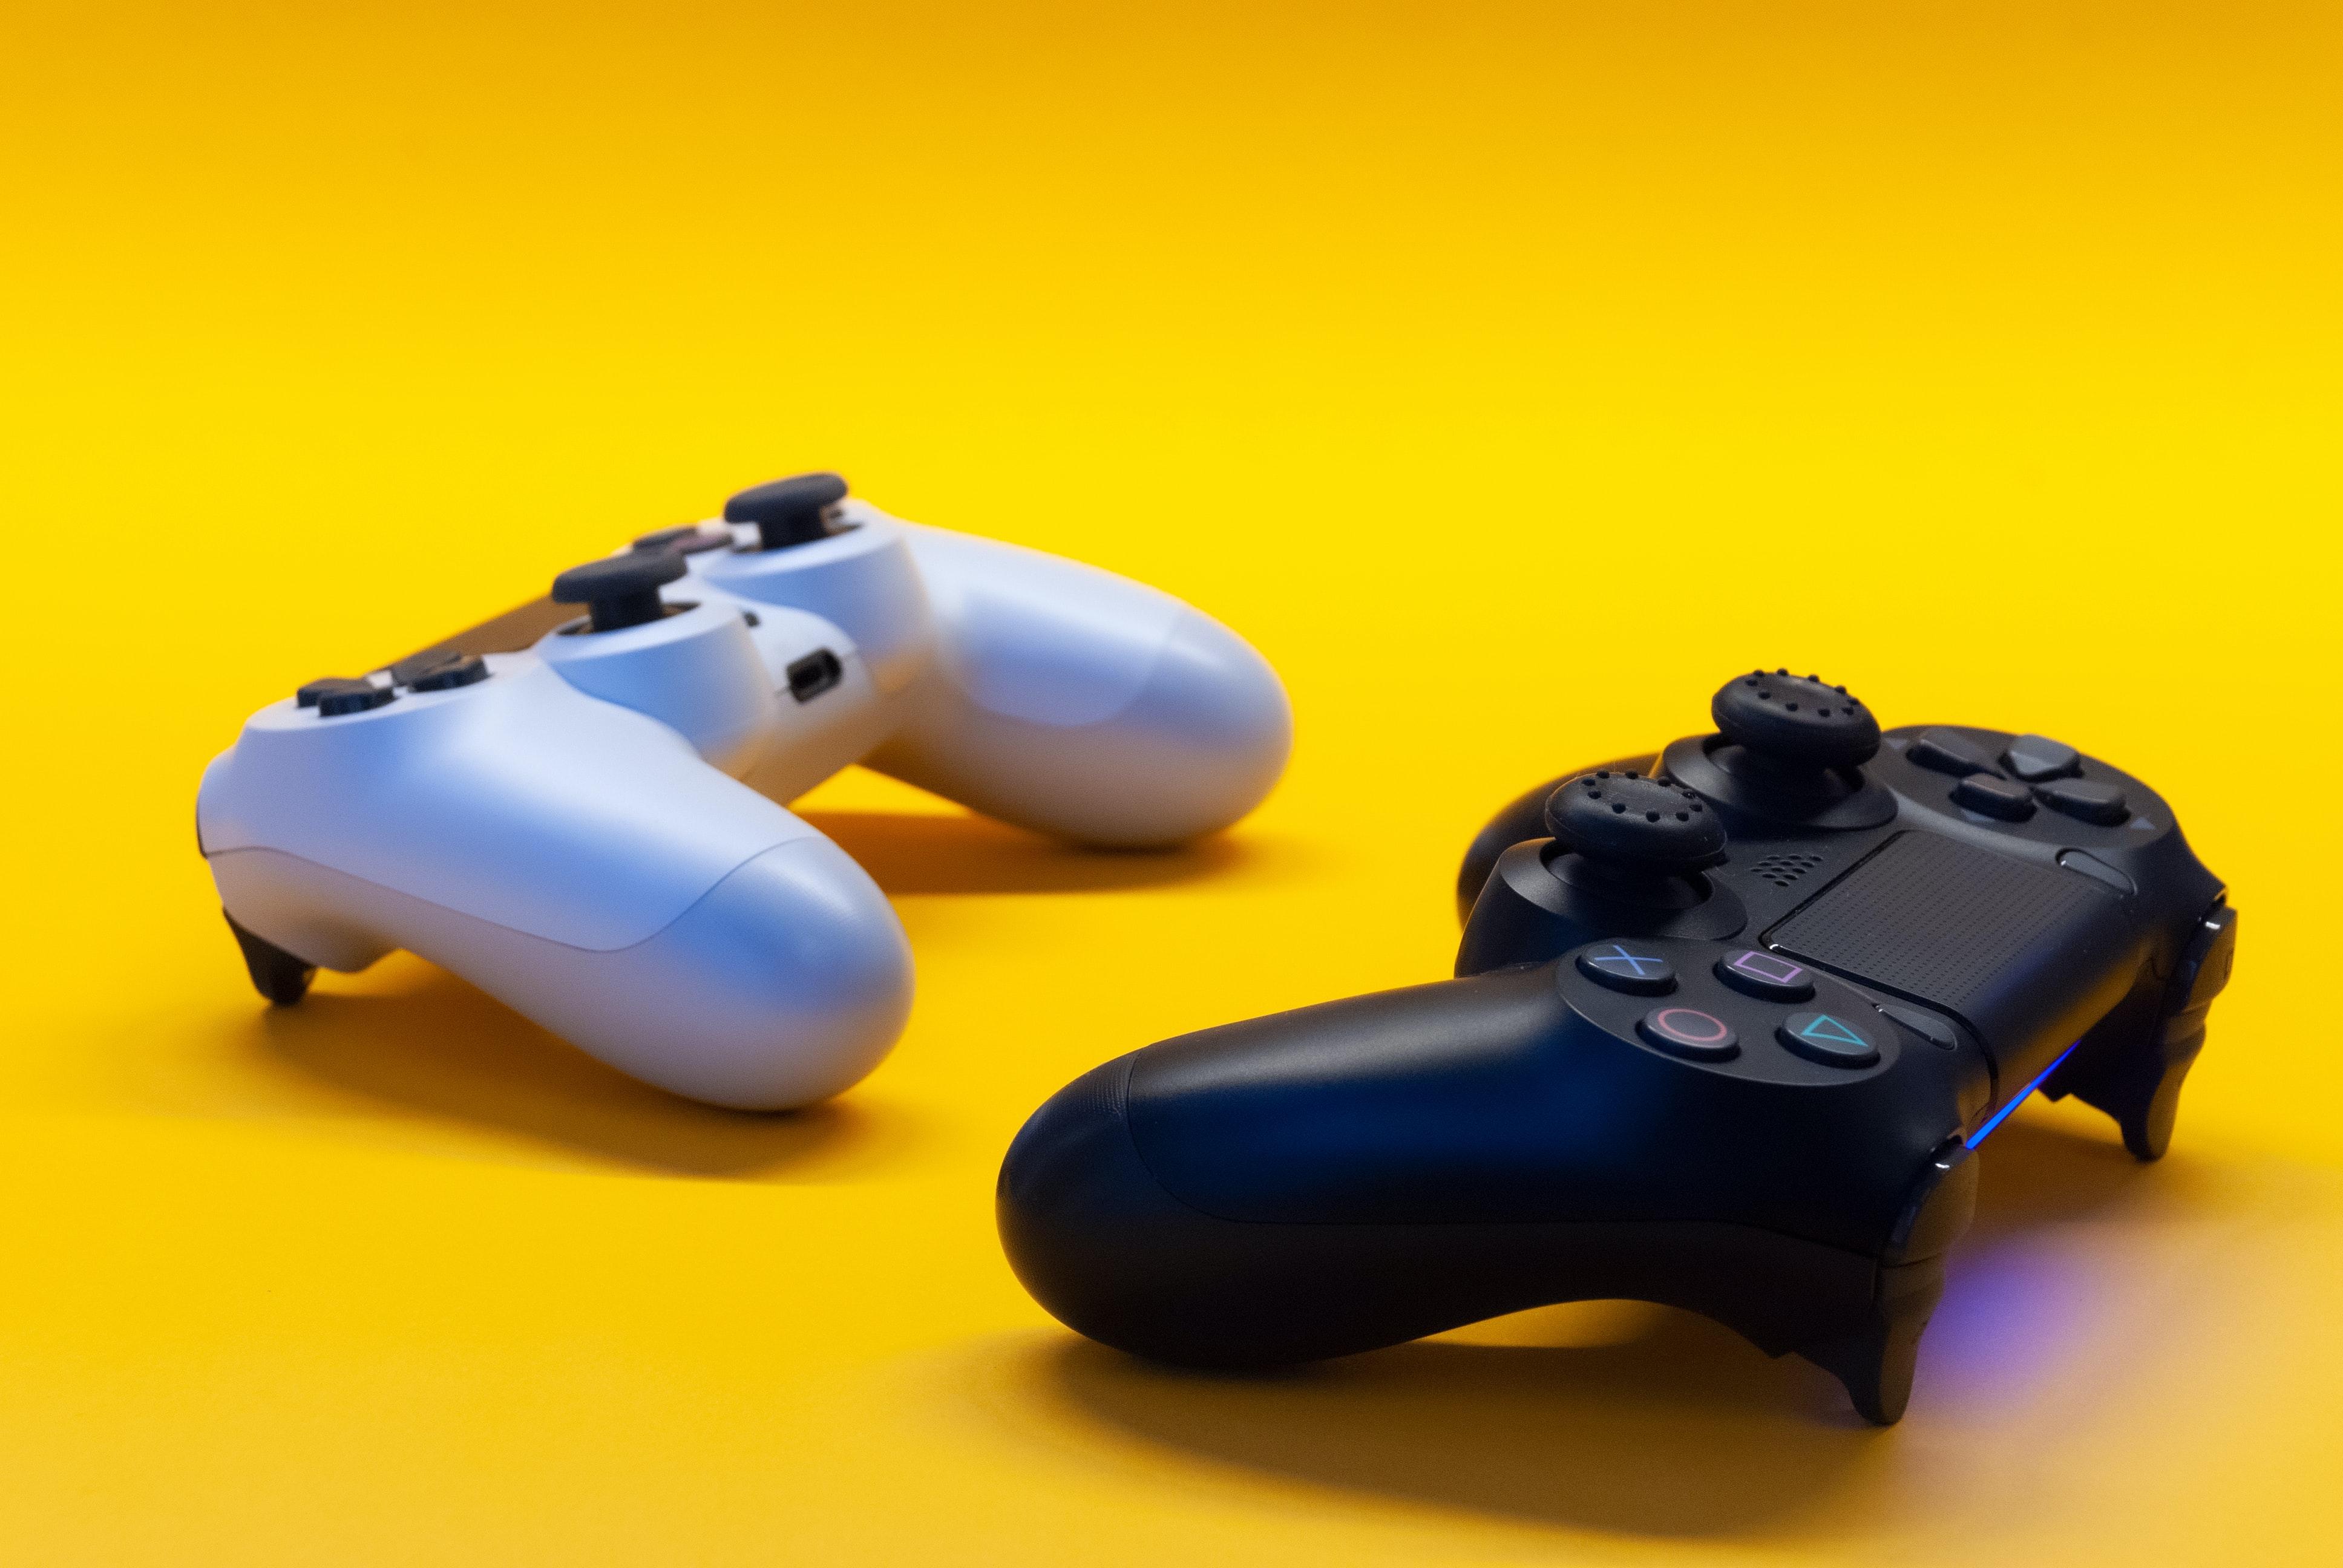 Confronting racial bias in video games - TechCrunch